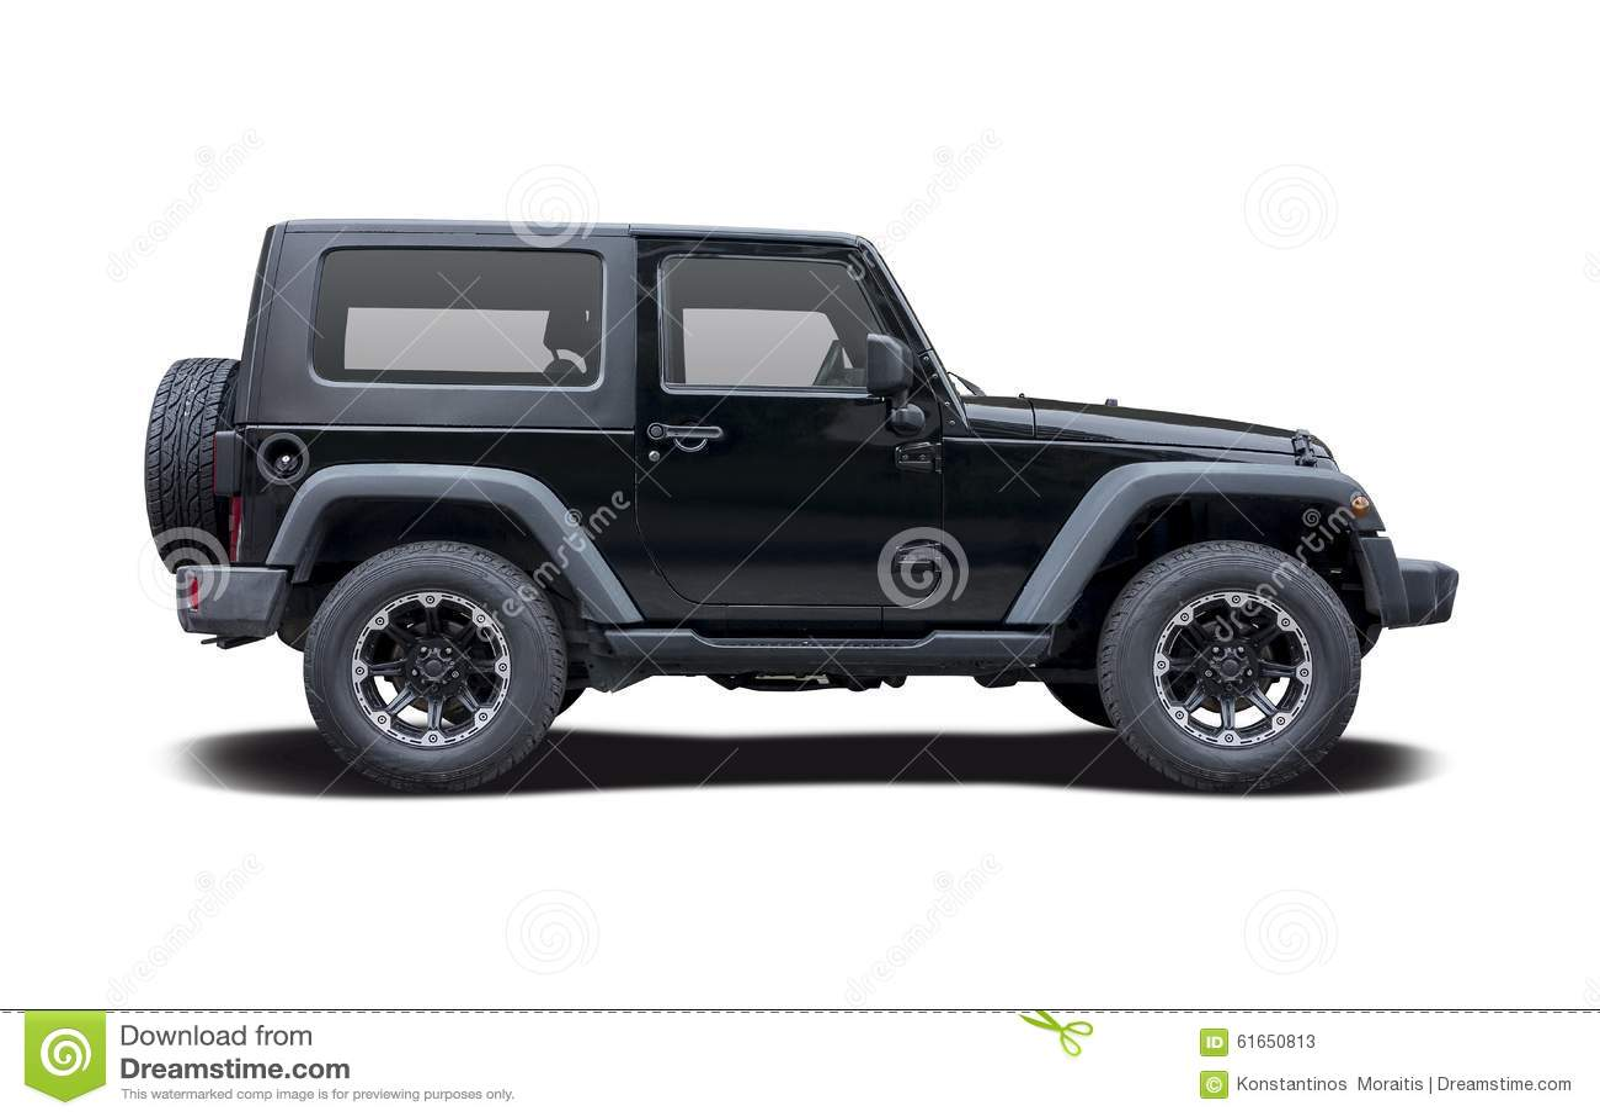 2004 jeep wrangler stereo wiring diagram jeep wrangler side view jeep wrangler sport stock photo - image: 61650813